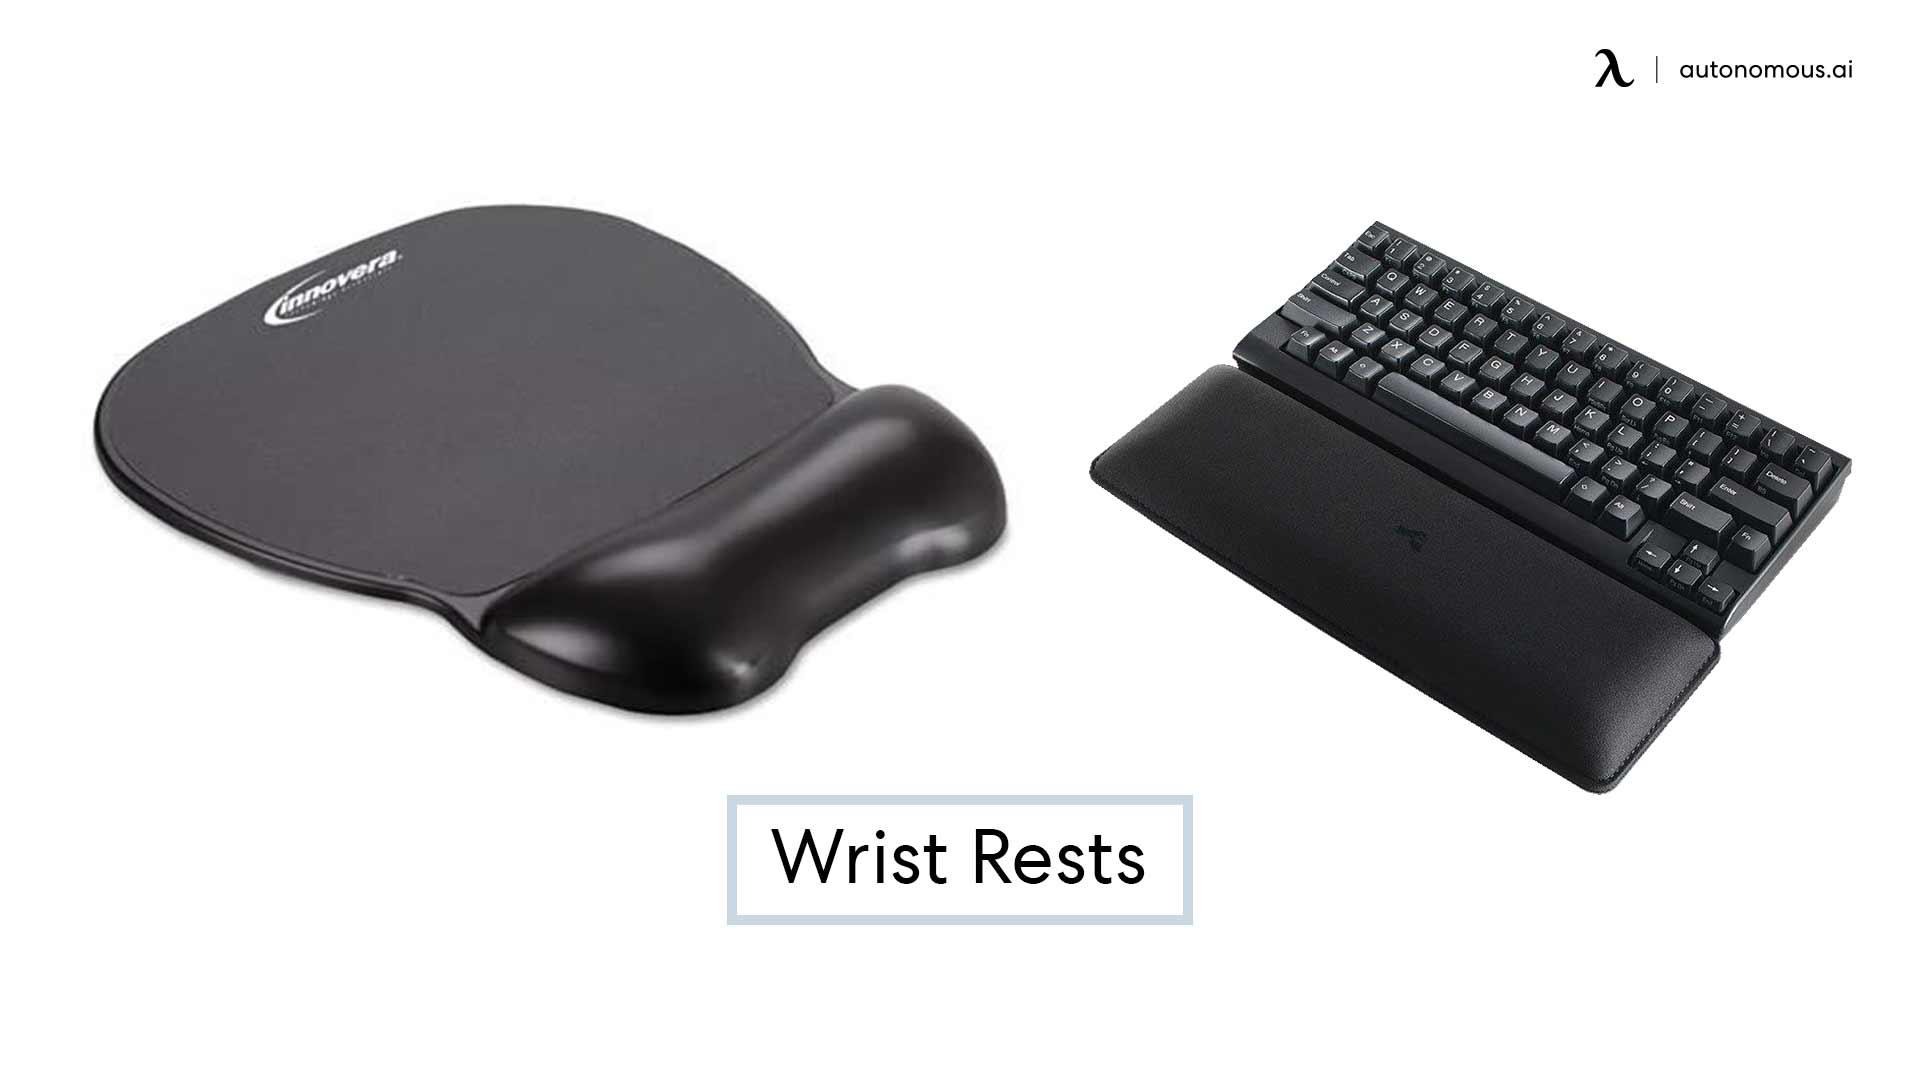 Photo of ergonomic keyboard wrist rests